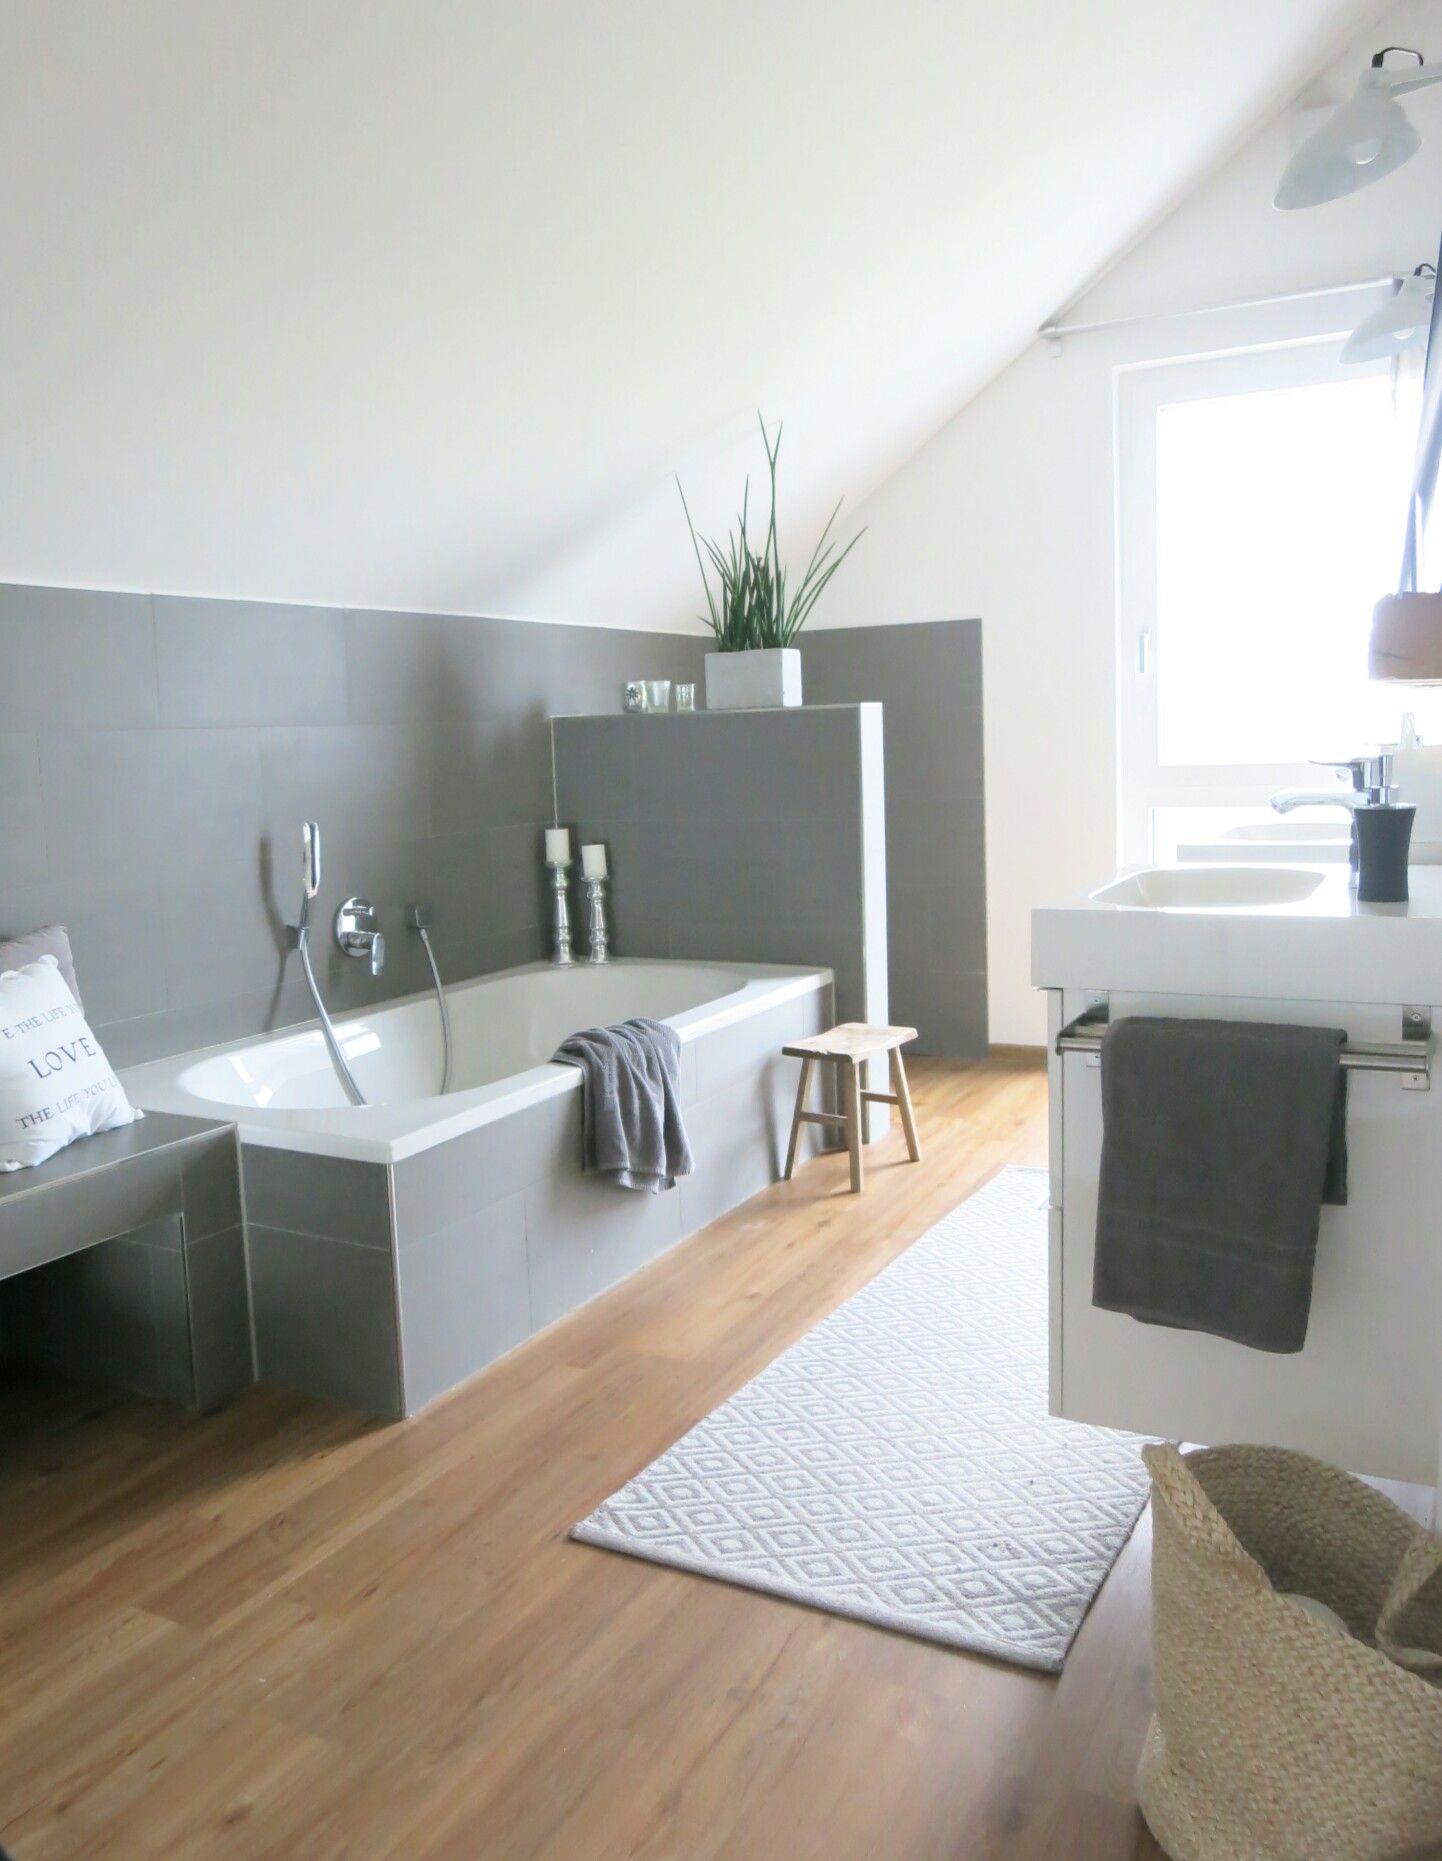 Wohndesign interieur badezimmer badezimmer  bad  pinterest  interiors bath and house